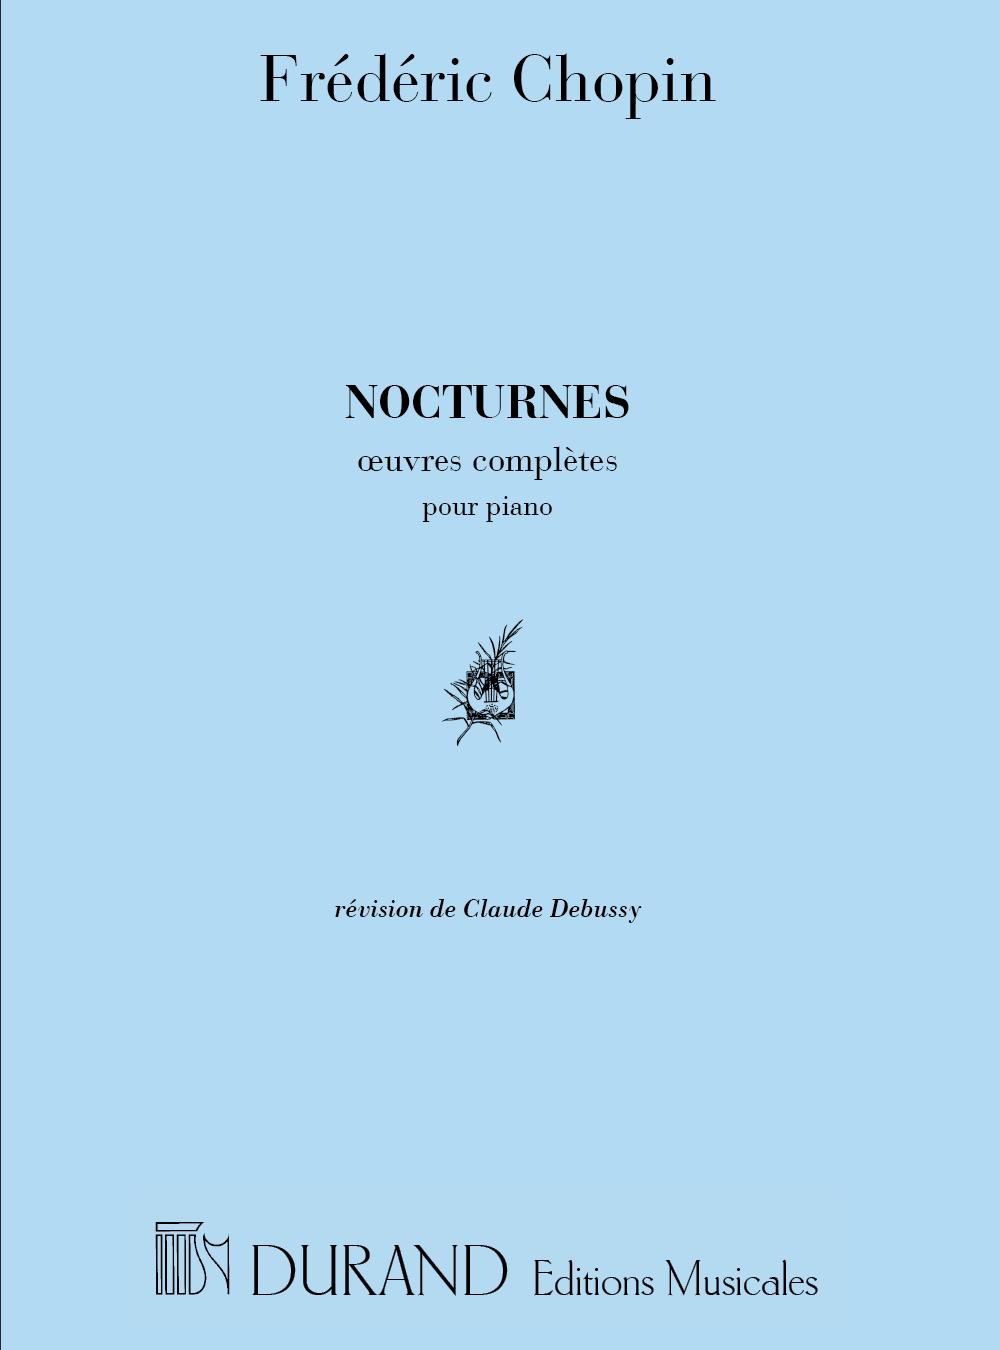 Frédéric Chopin: Nocturnes - Révision De Claude Debussy: Piano: Instrumental